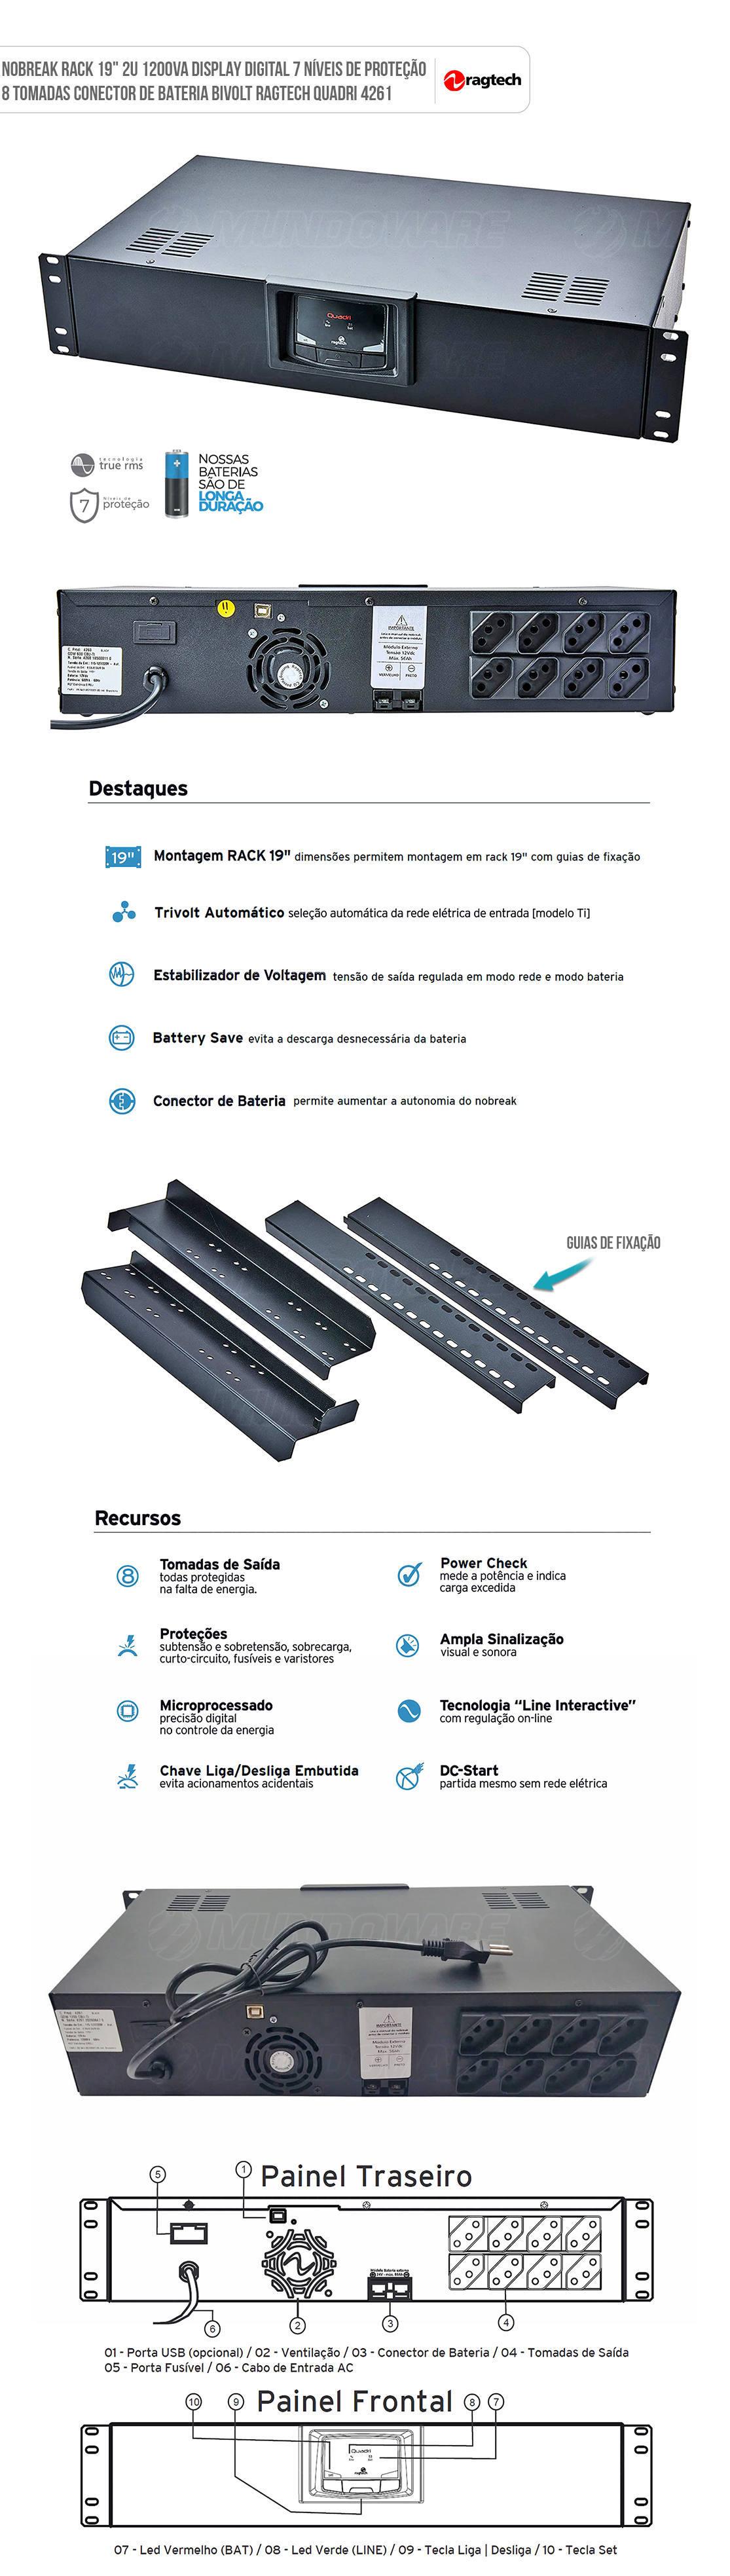 Nobreak Rack 19 polegadas 1200VA Display Digital 7 Níveis de Proteção 8 Tomadas Engate Bateria Externa Bivolt Ragtech Quadri 4261